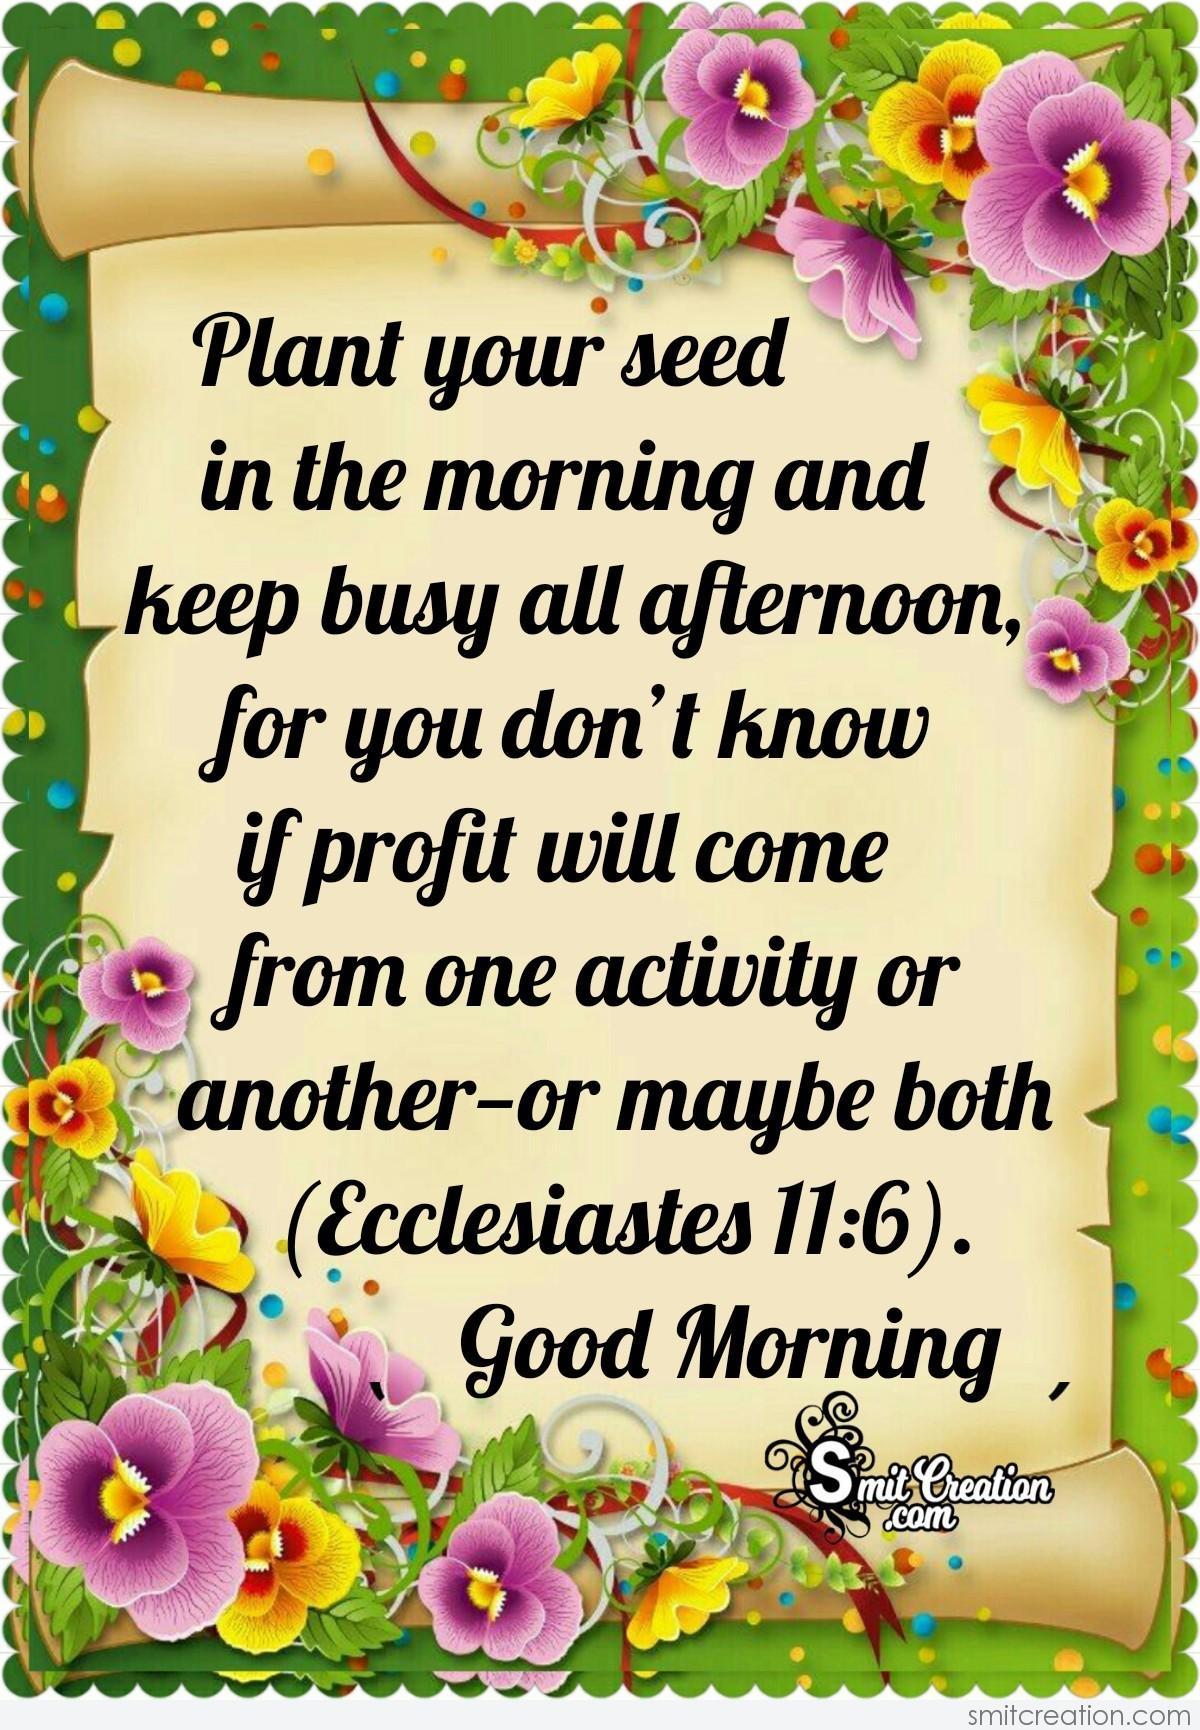 Good Morning Bible Quotes Images   SmitCreation.com